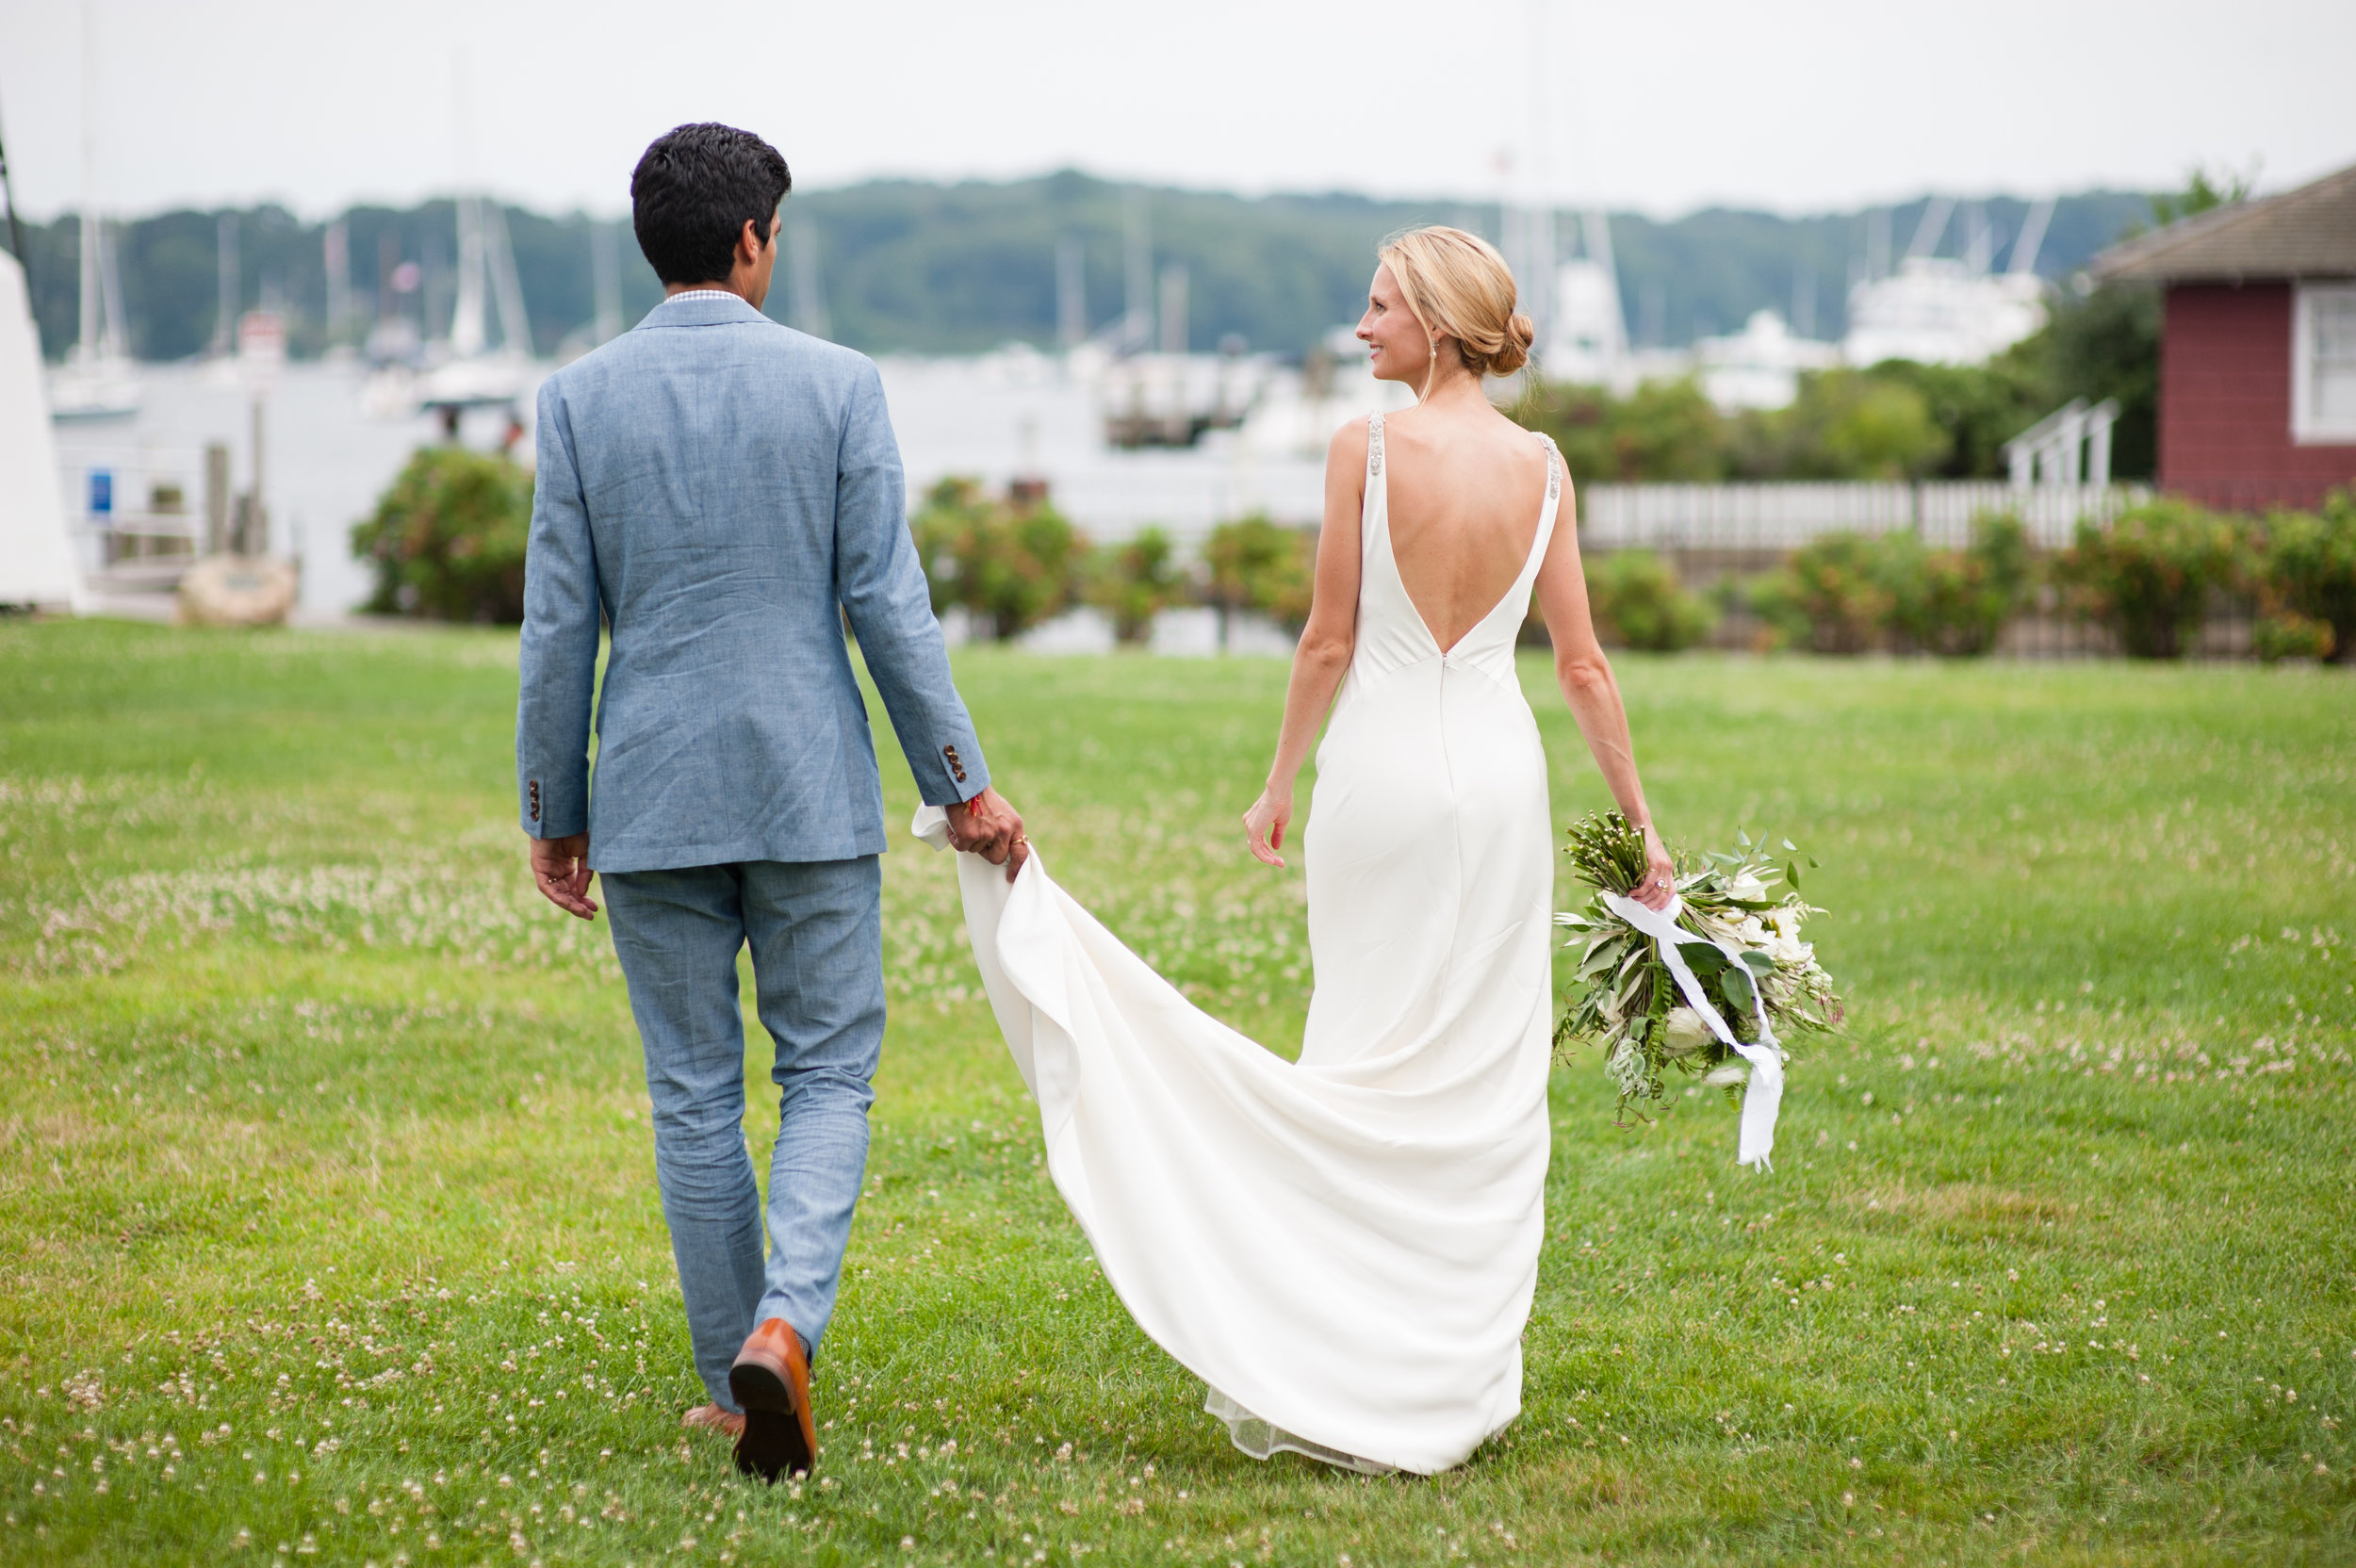 erica_shantanu_wedding-717.jpg